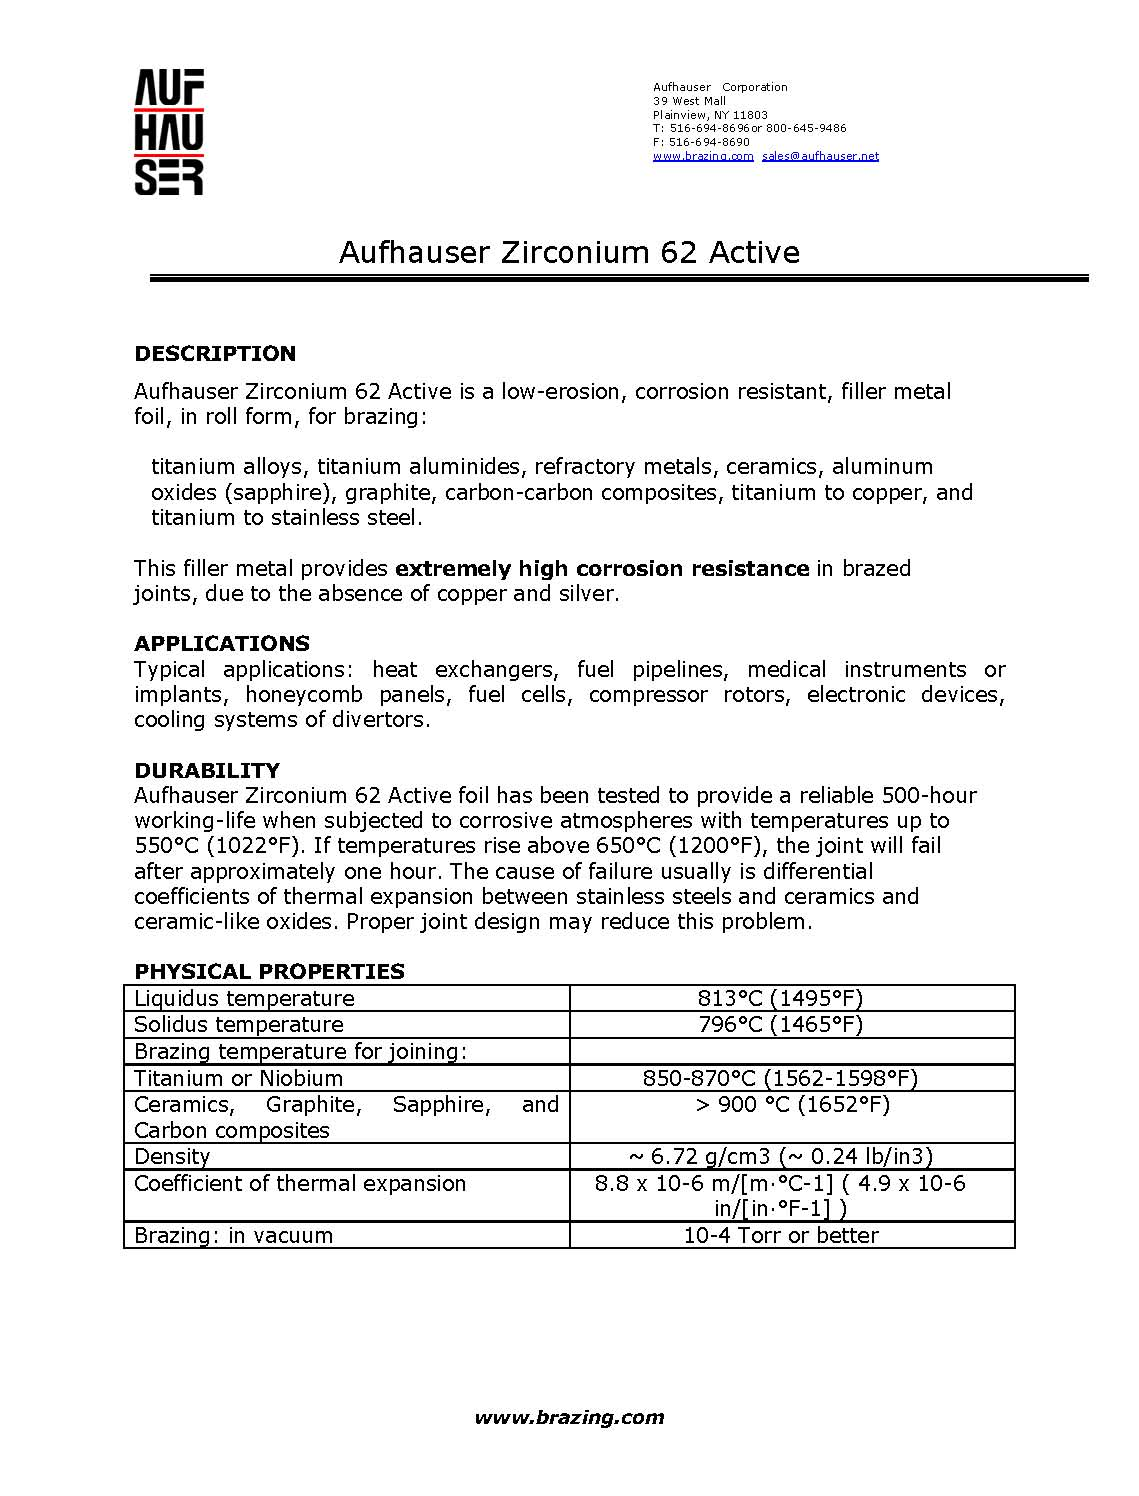 Aufhauser Foils Zirconium 62 Active